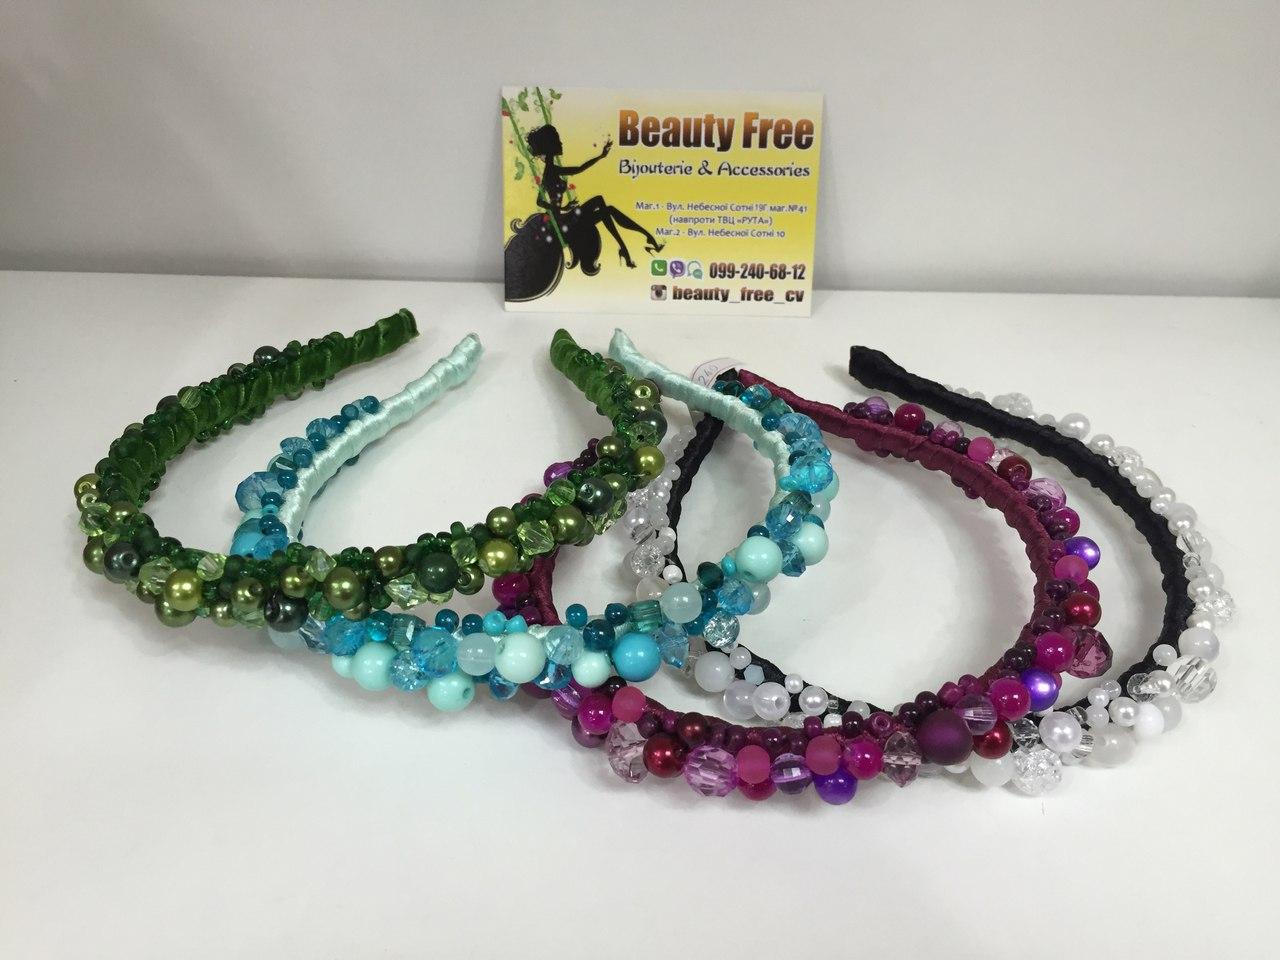 Прикраси для твого випускного @ Магазин «Beauty Free»